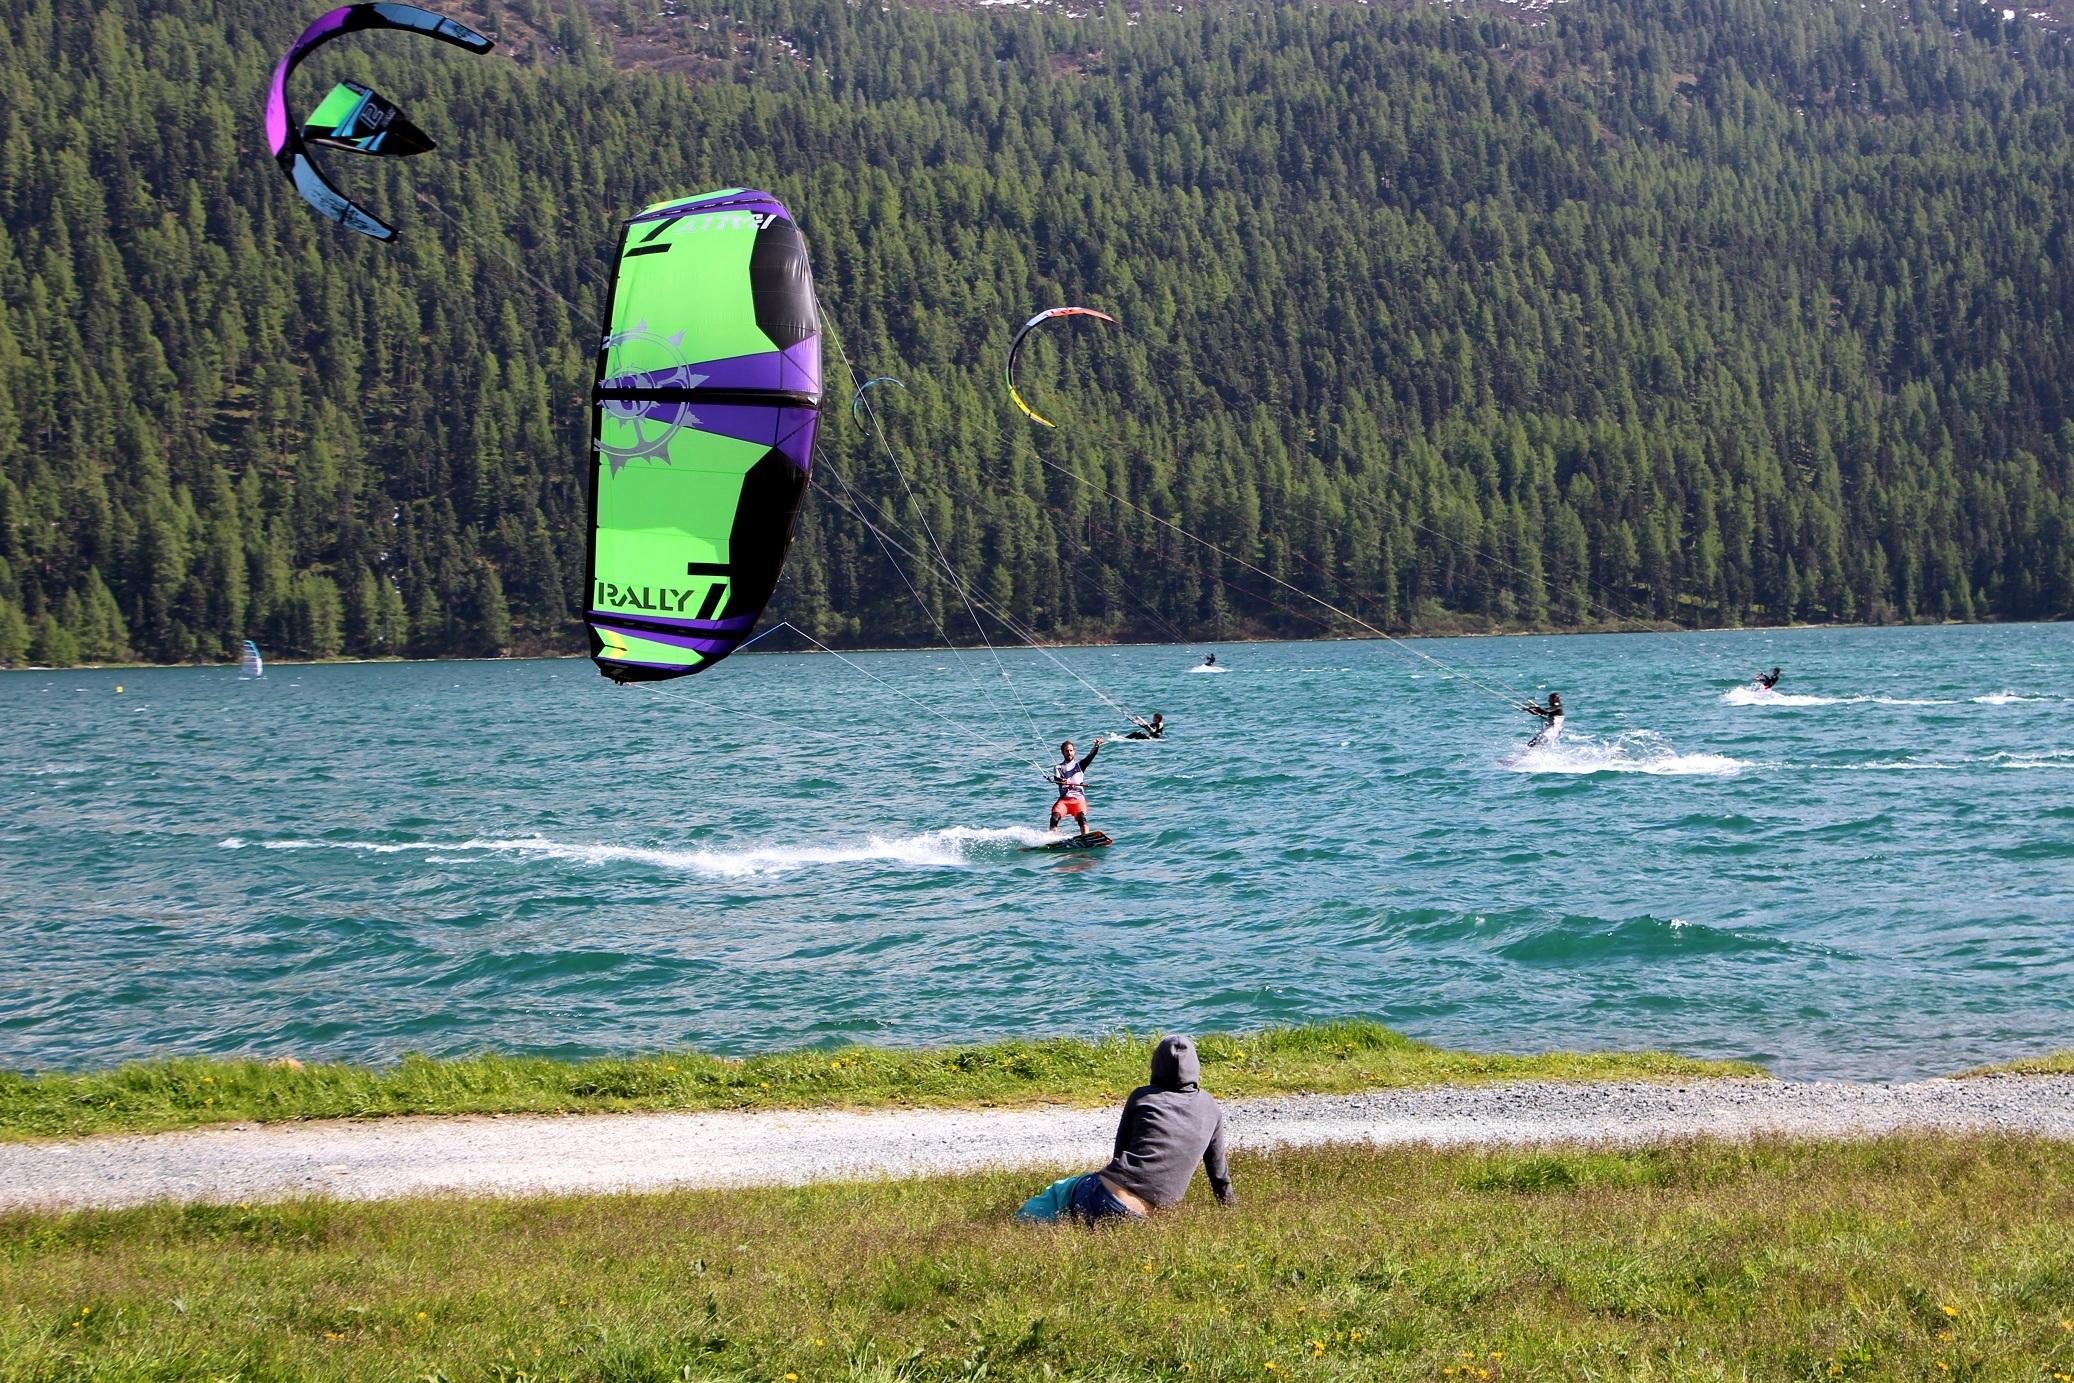 Swiss Kitesurf GmbH Slide 1